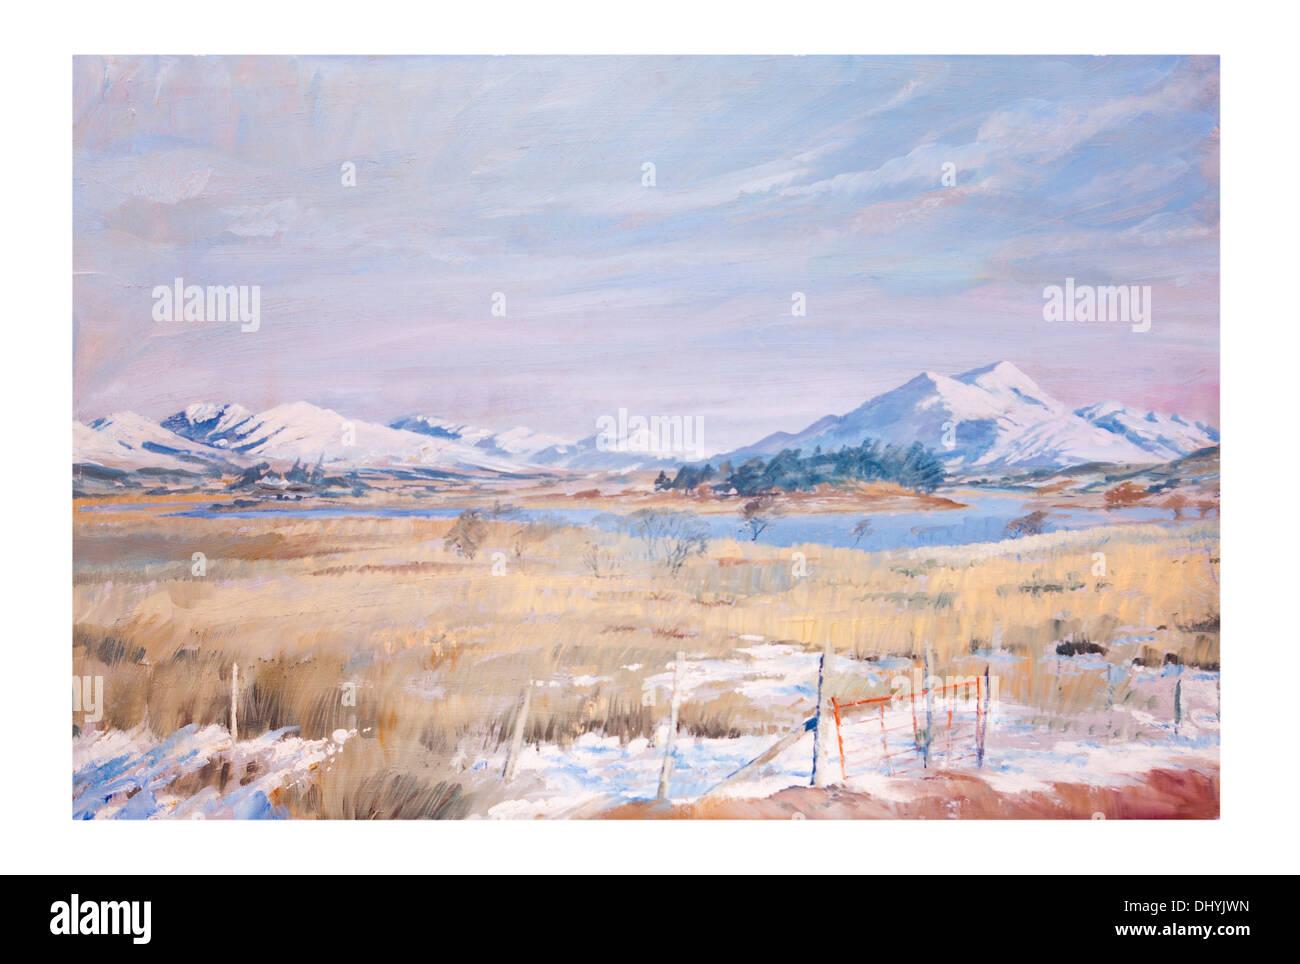 Scottish Winter Mountain Landscape Oil Painting - Stock Image